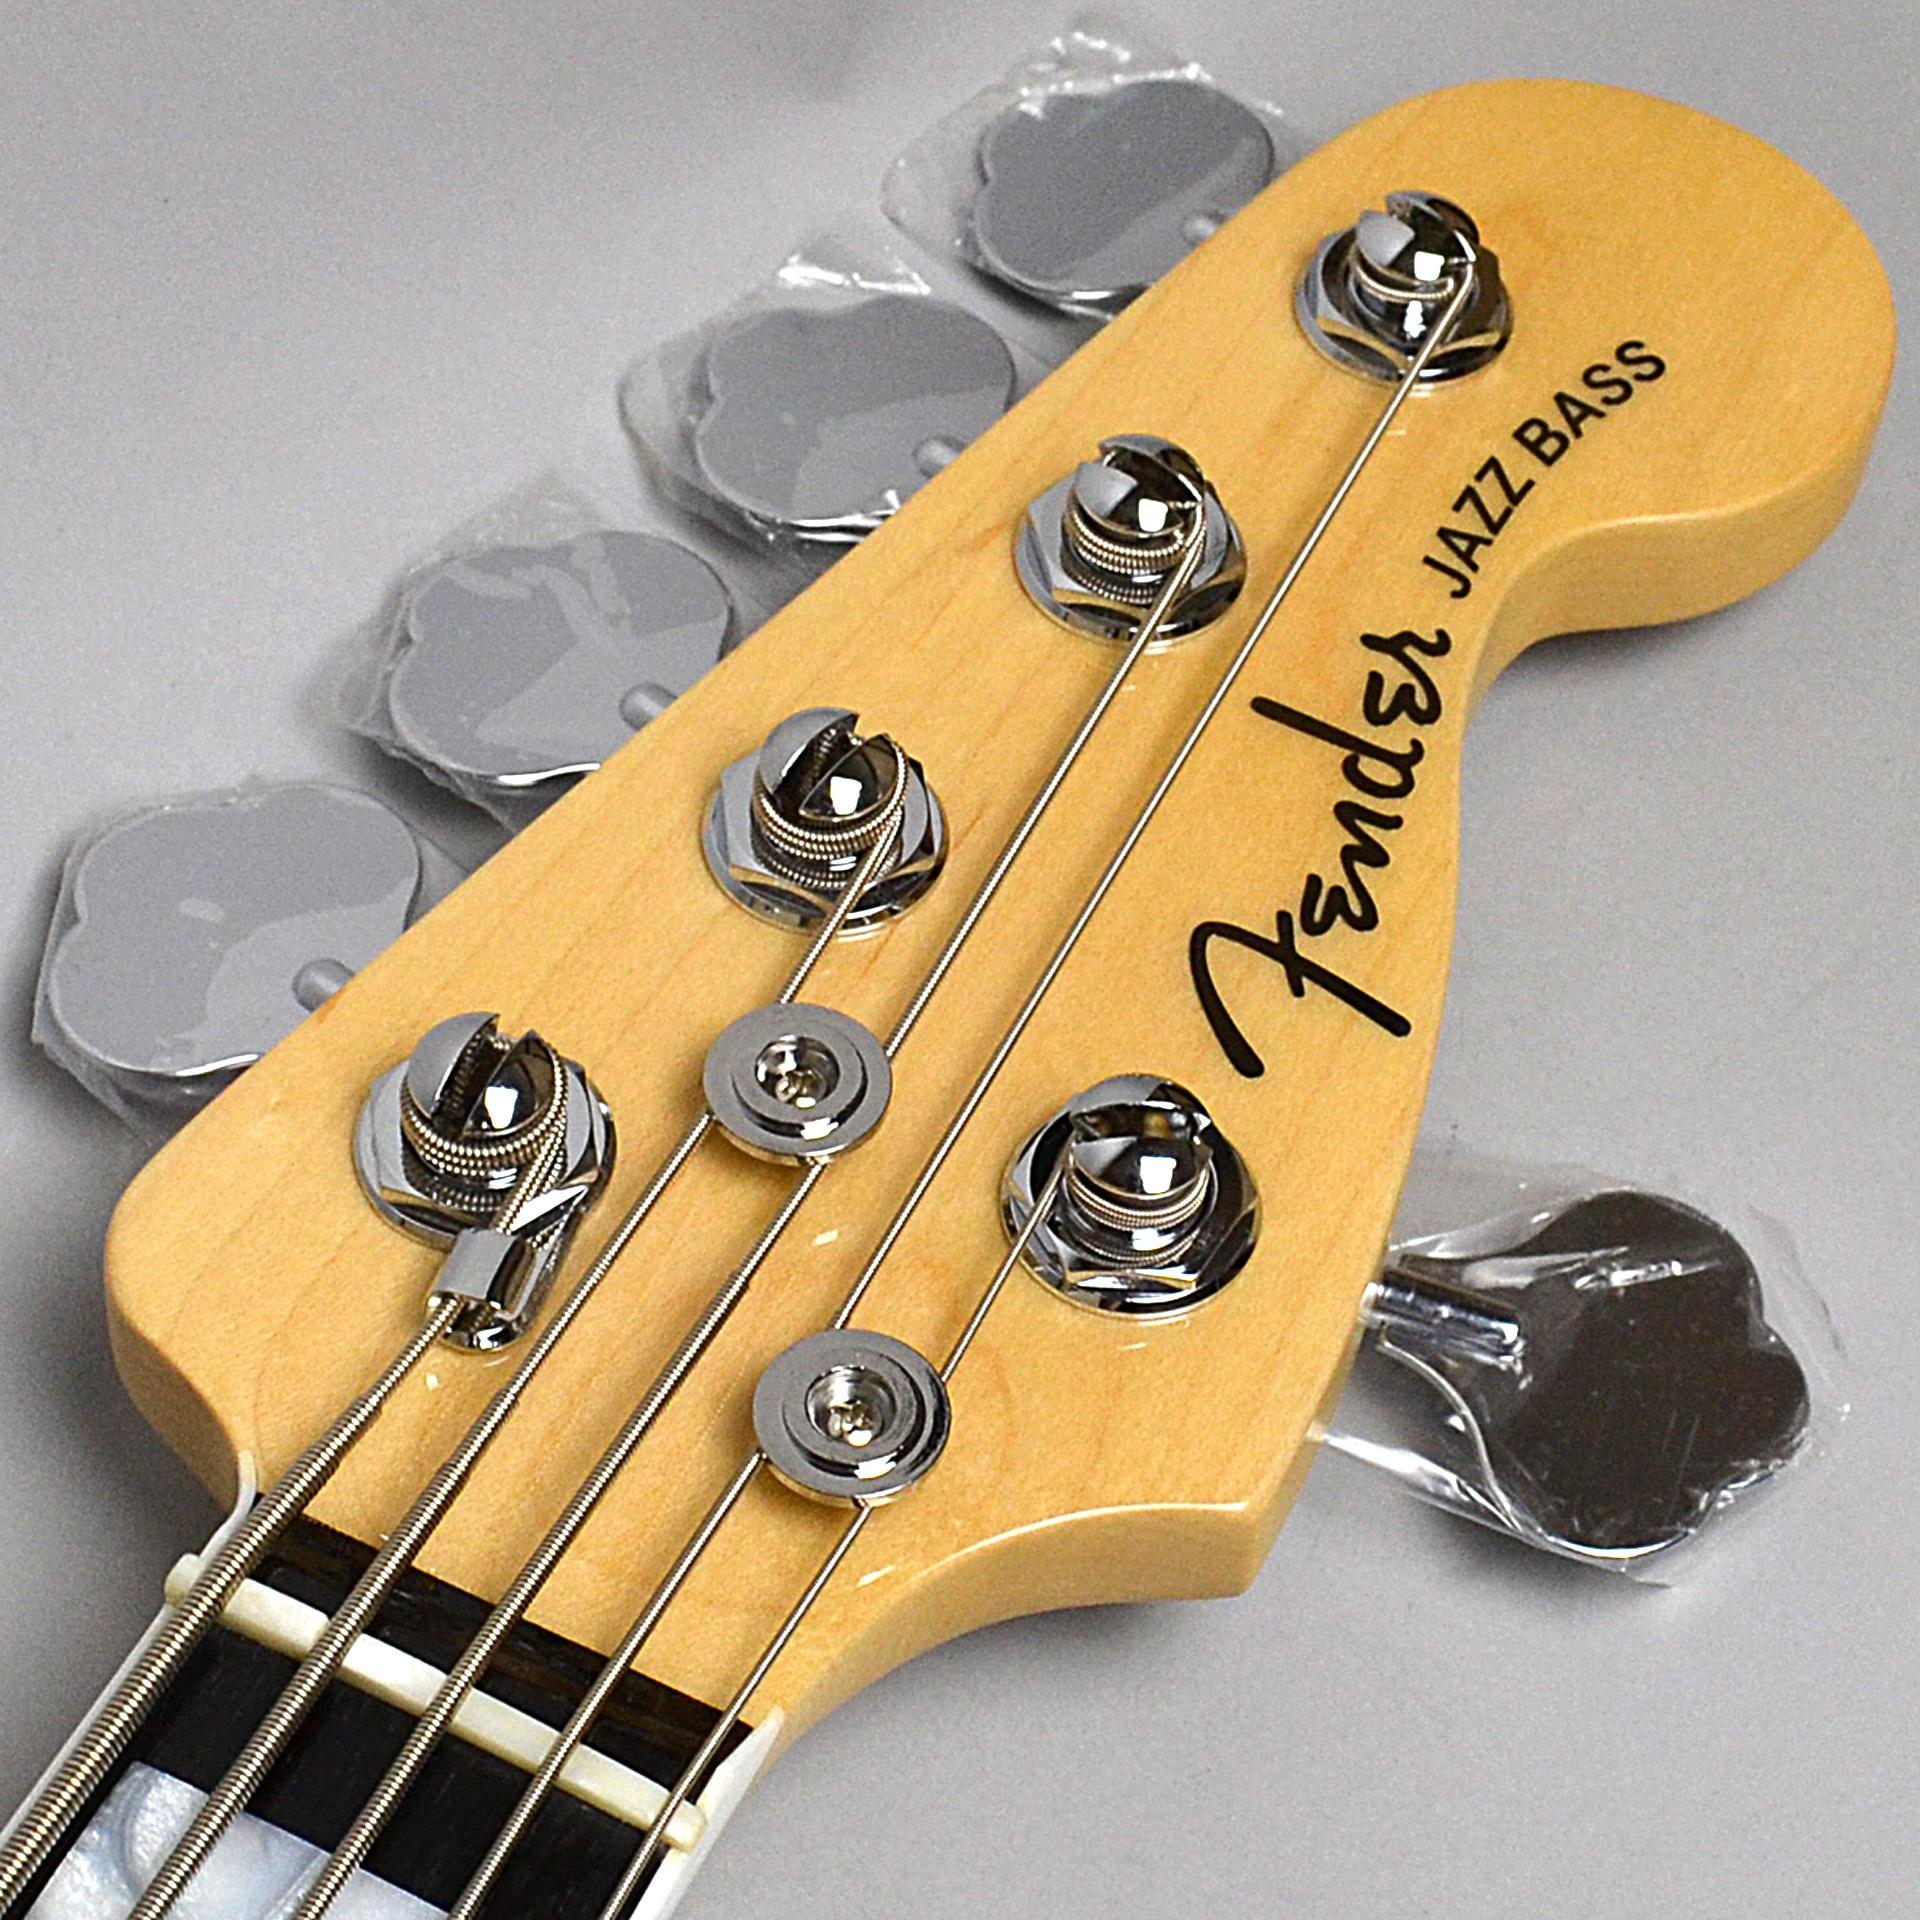 American Elite Jazz Bass V, Ebony Fingerboardのヘッド画像